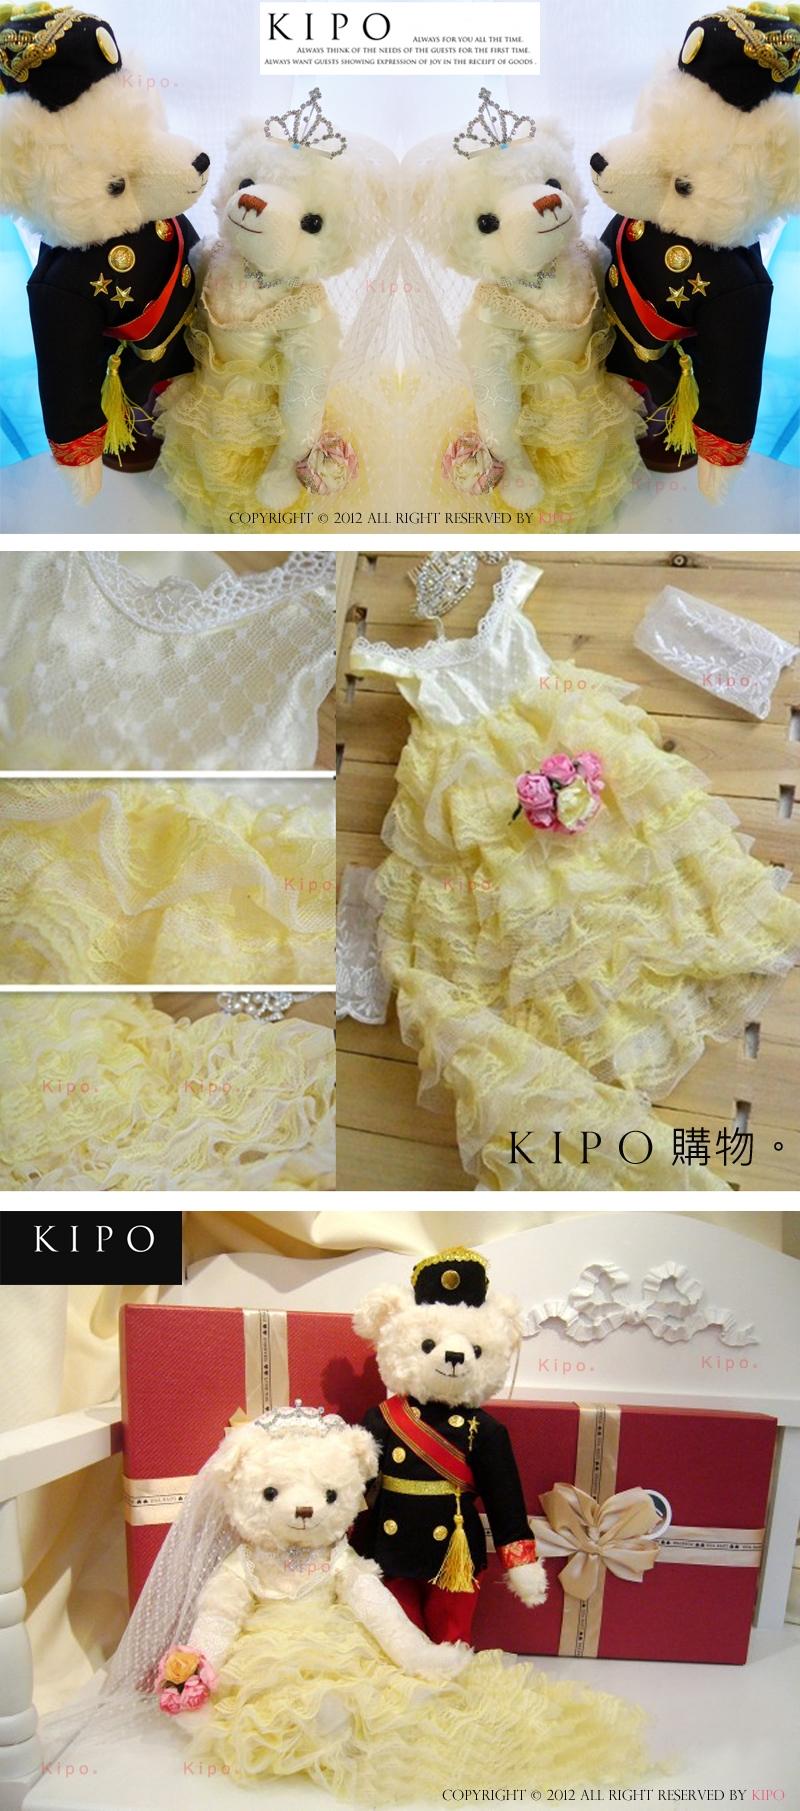 http://www.kipo.com.tw/EDM/buyimage/NCJ008092A/p6.jpg